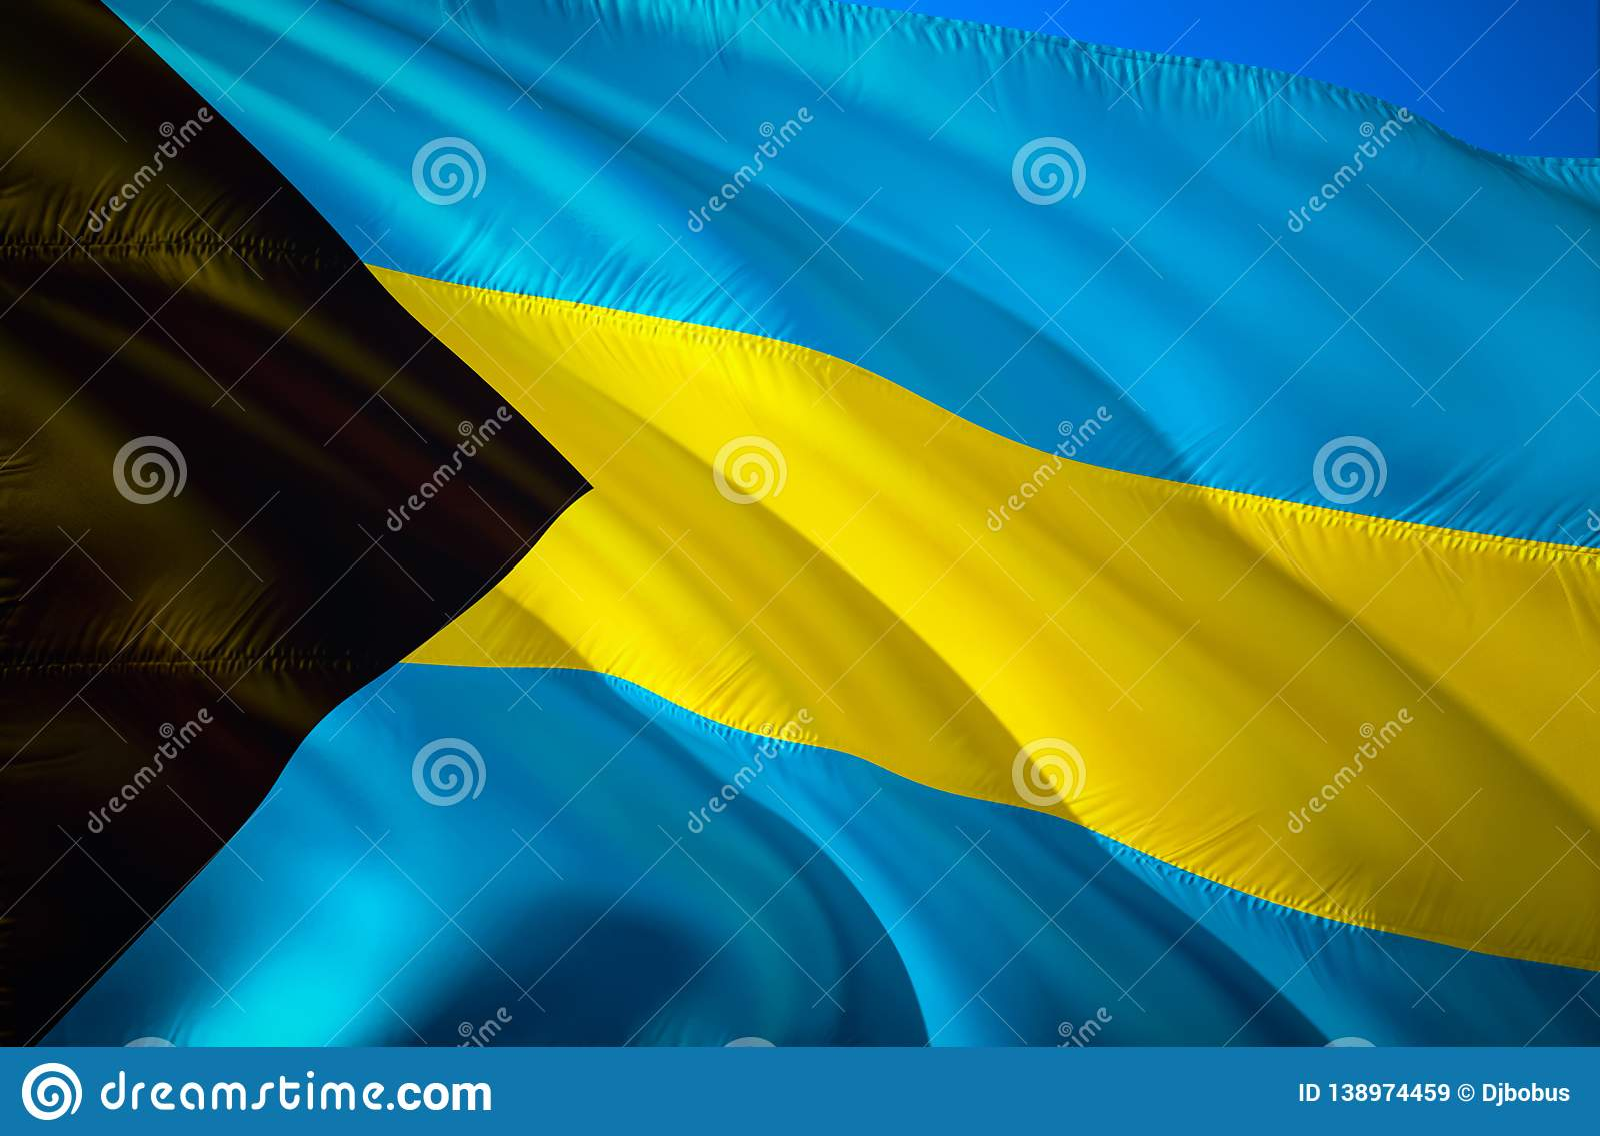 Bahamas Flag 3d Waving Flag Design The National Symbol